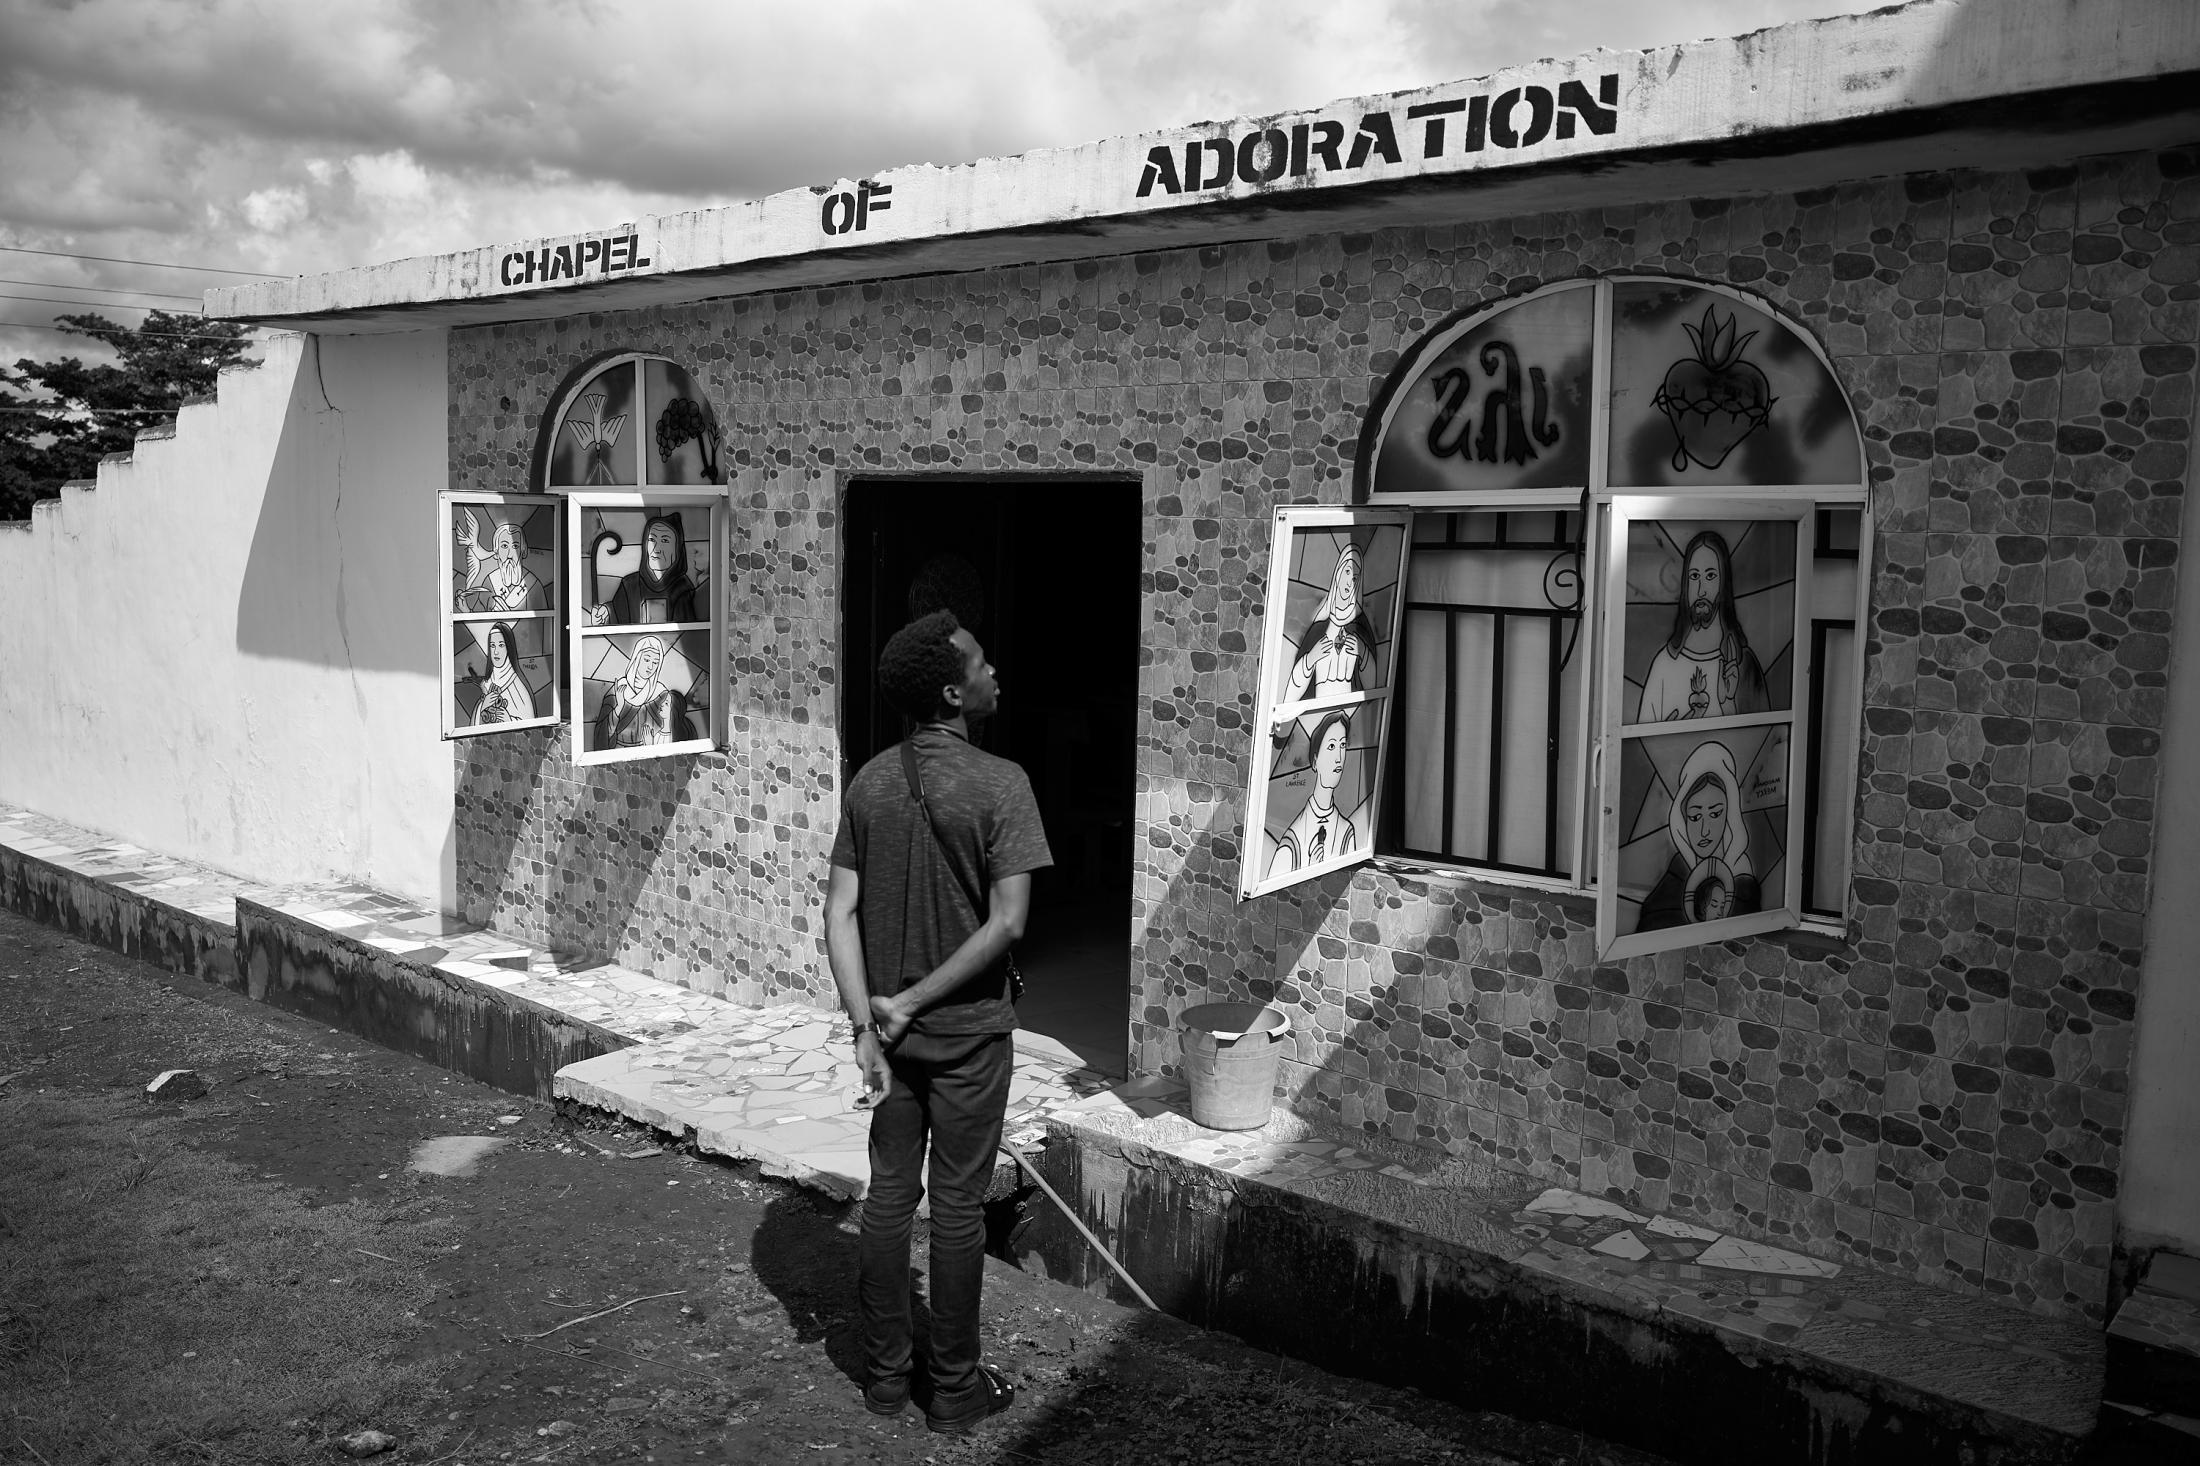 chapel of adoration,ikom (nigeria-cameroun border town), nigeria.